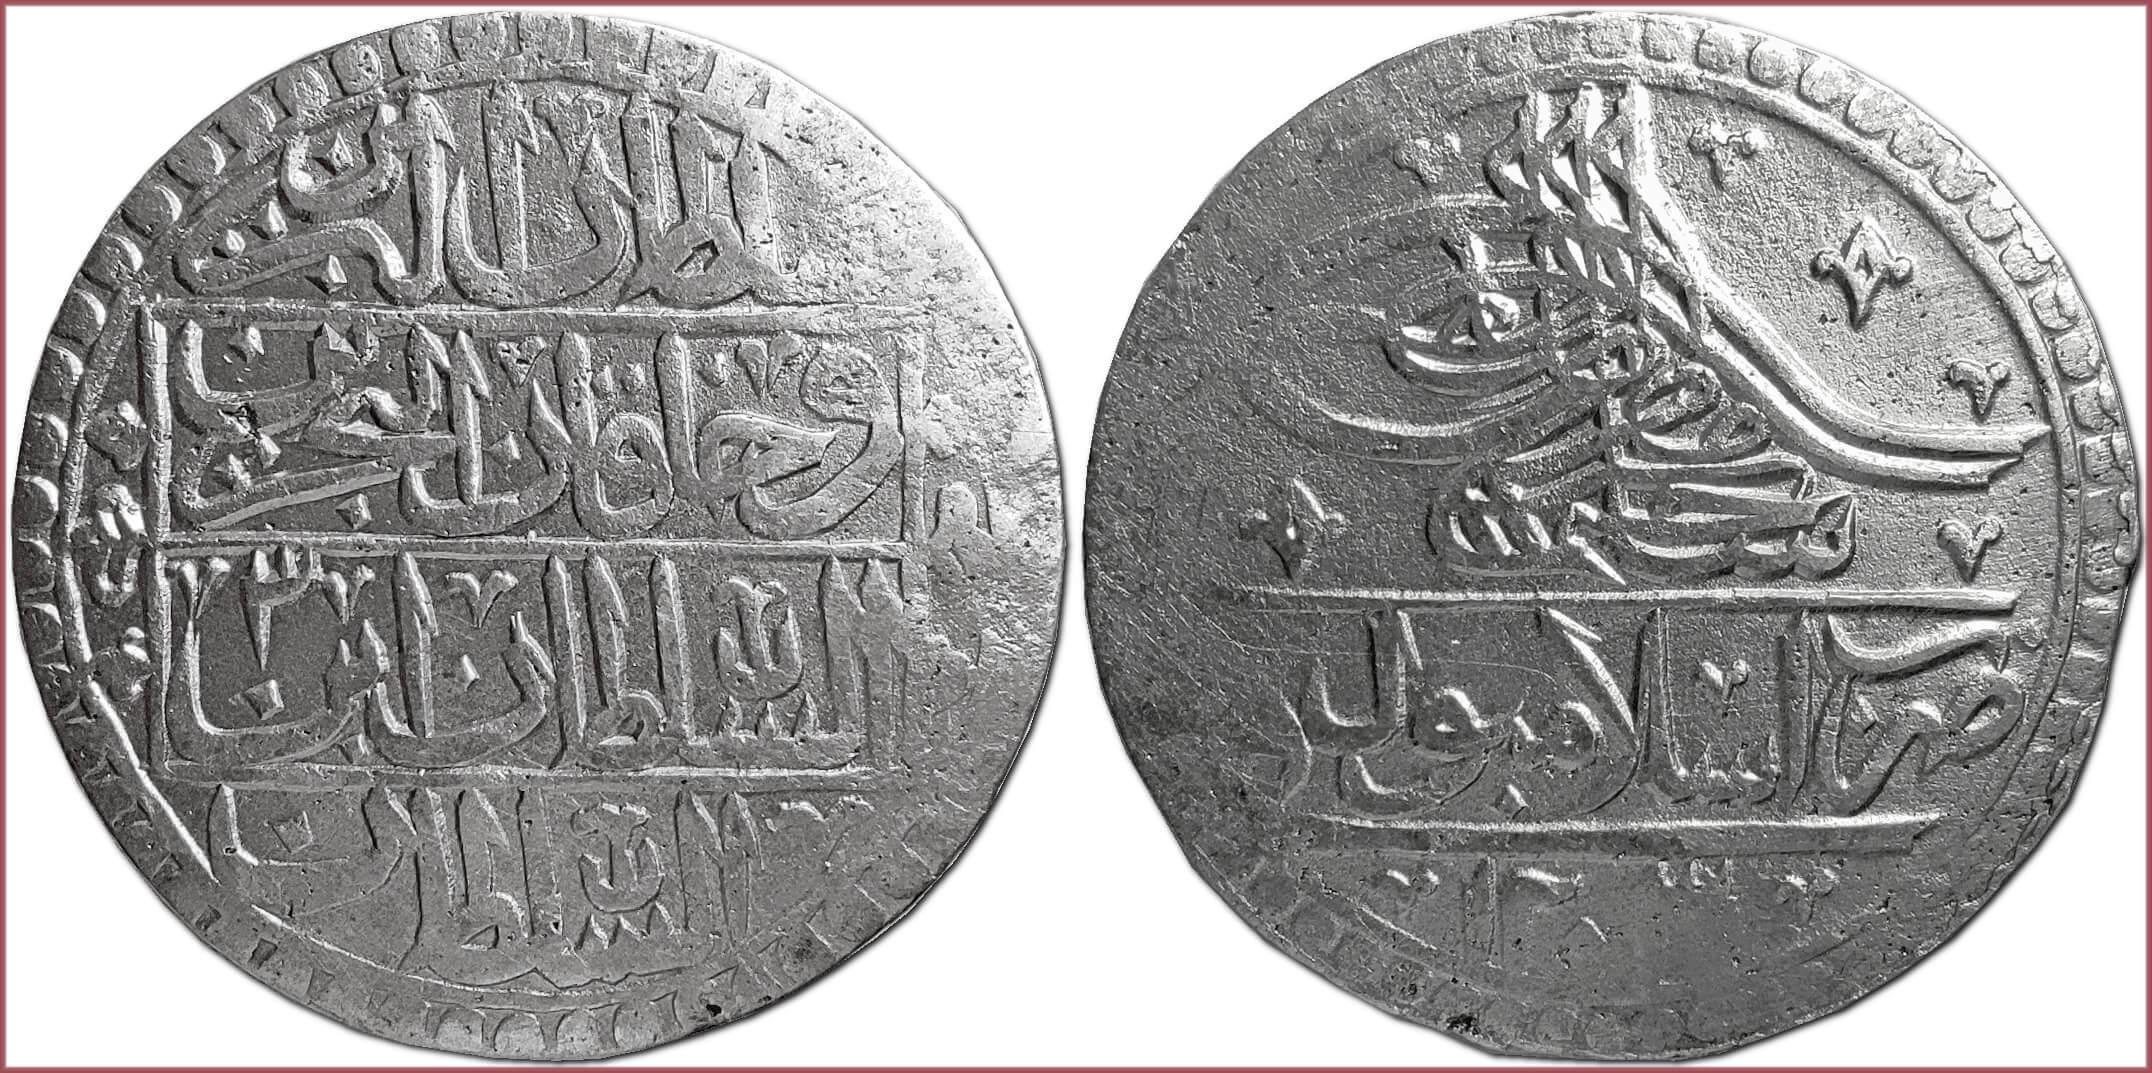 Yuzluk, 1791: Ottoman Empire